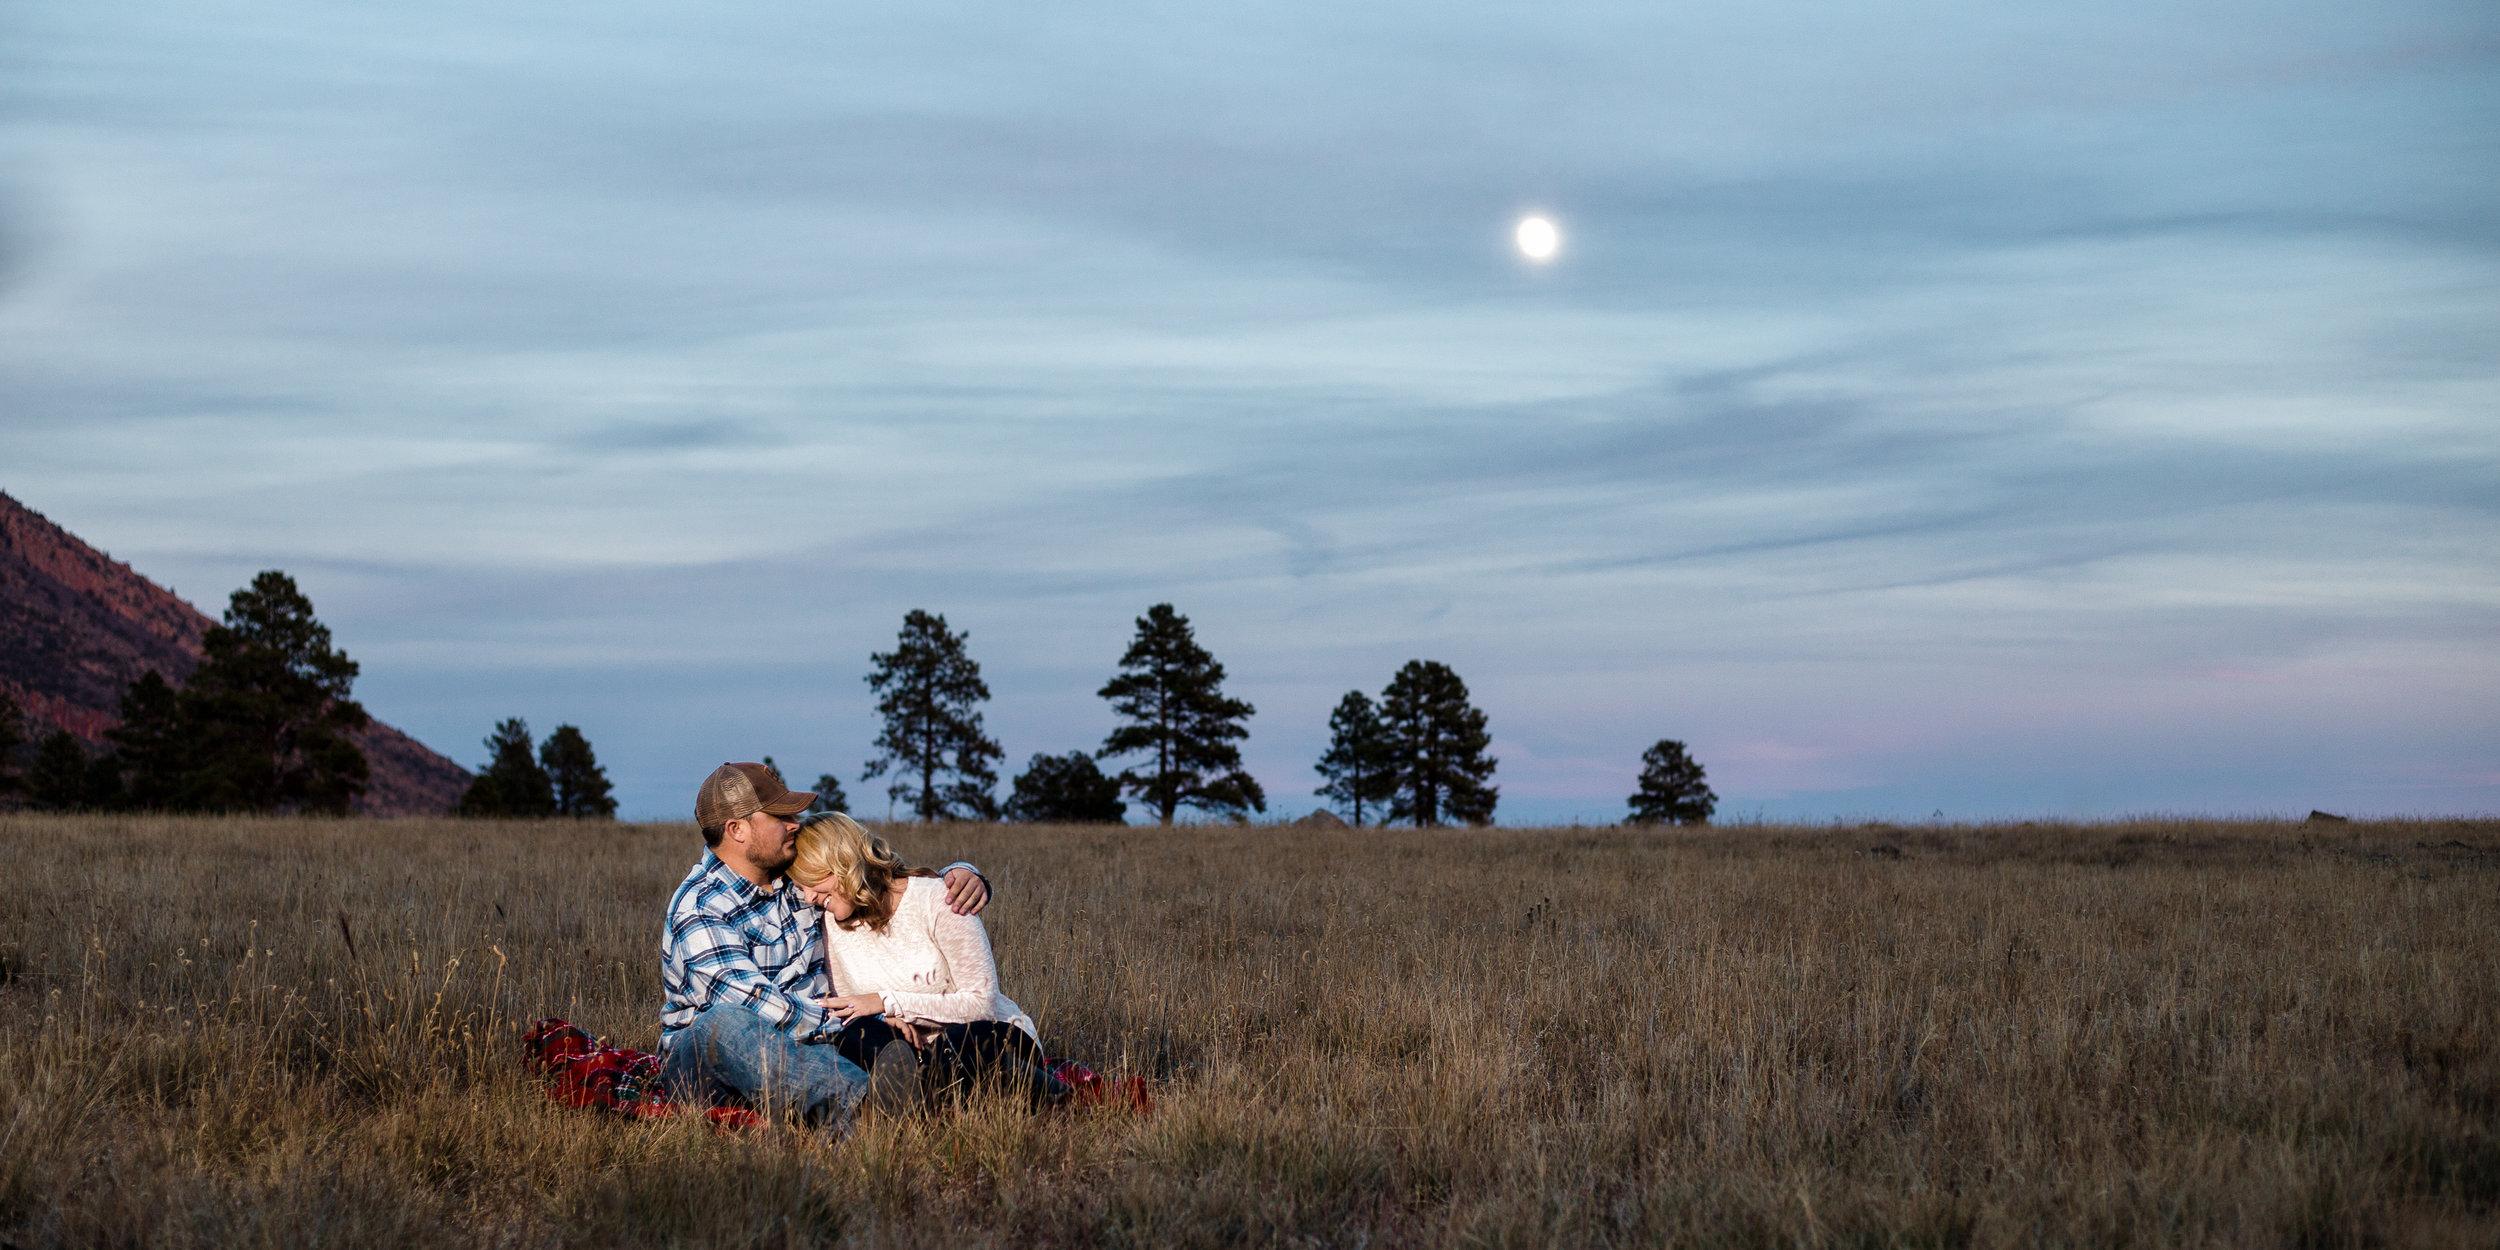 Moonrise at Buffalo Park, Flagstaff Arizona.